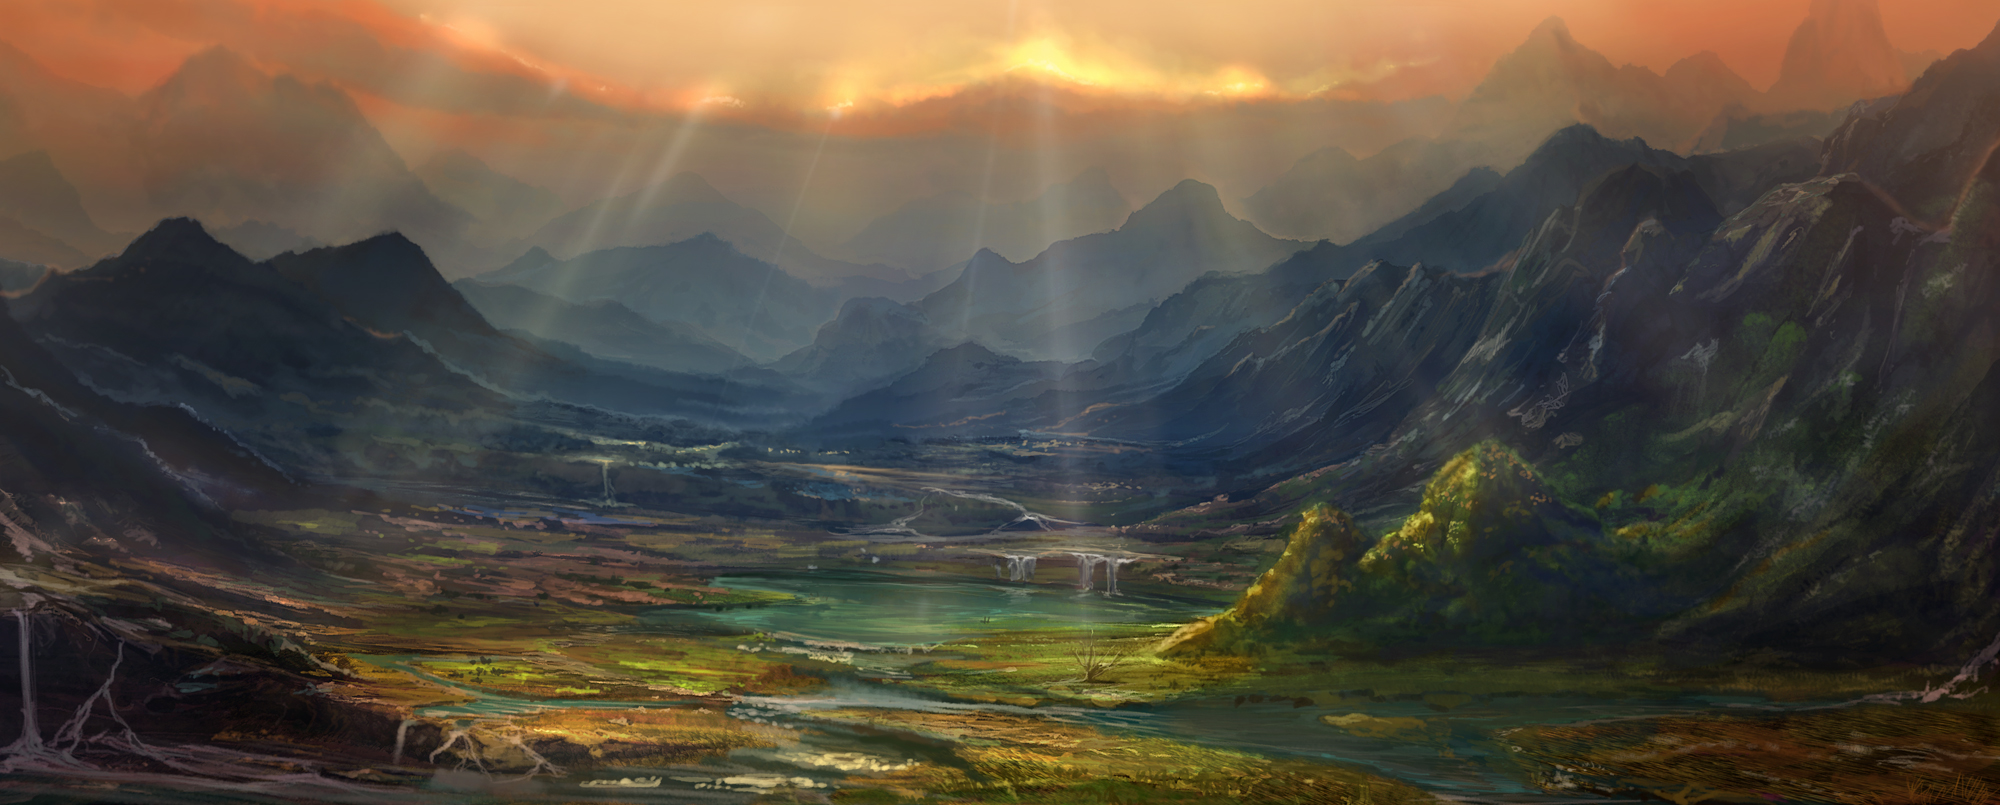 Fantasy war landscape - photo#21